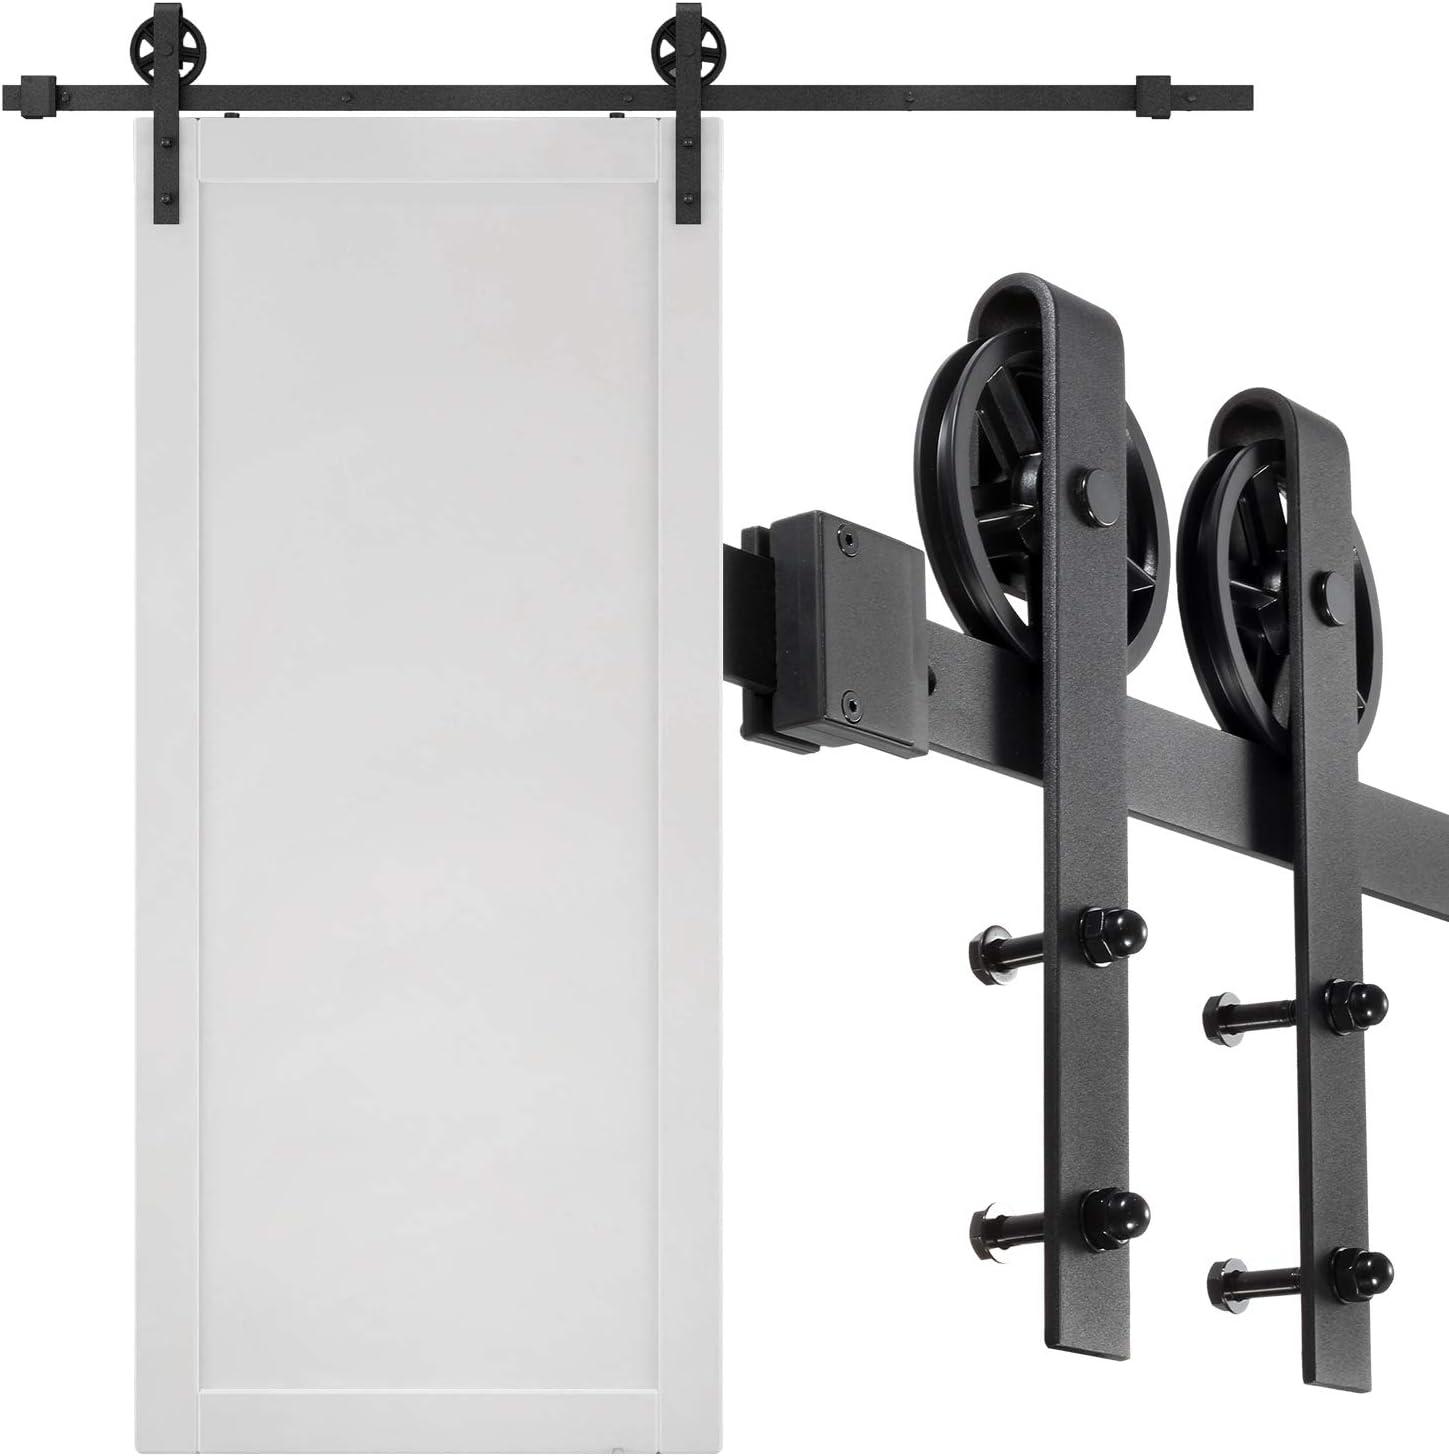 VIPEK 6.6 FT Heavy Duty Sliding Barn Door Hardware Kit Sliding Track Double Rail fit for 36 to 40 inch Wide Door Panel Black Industrial Big Wheel Hangers